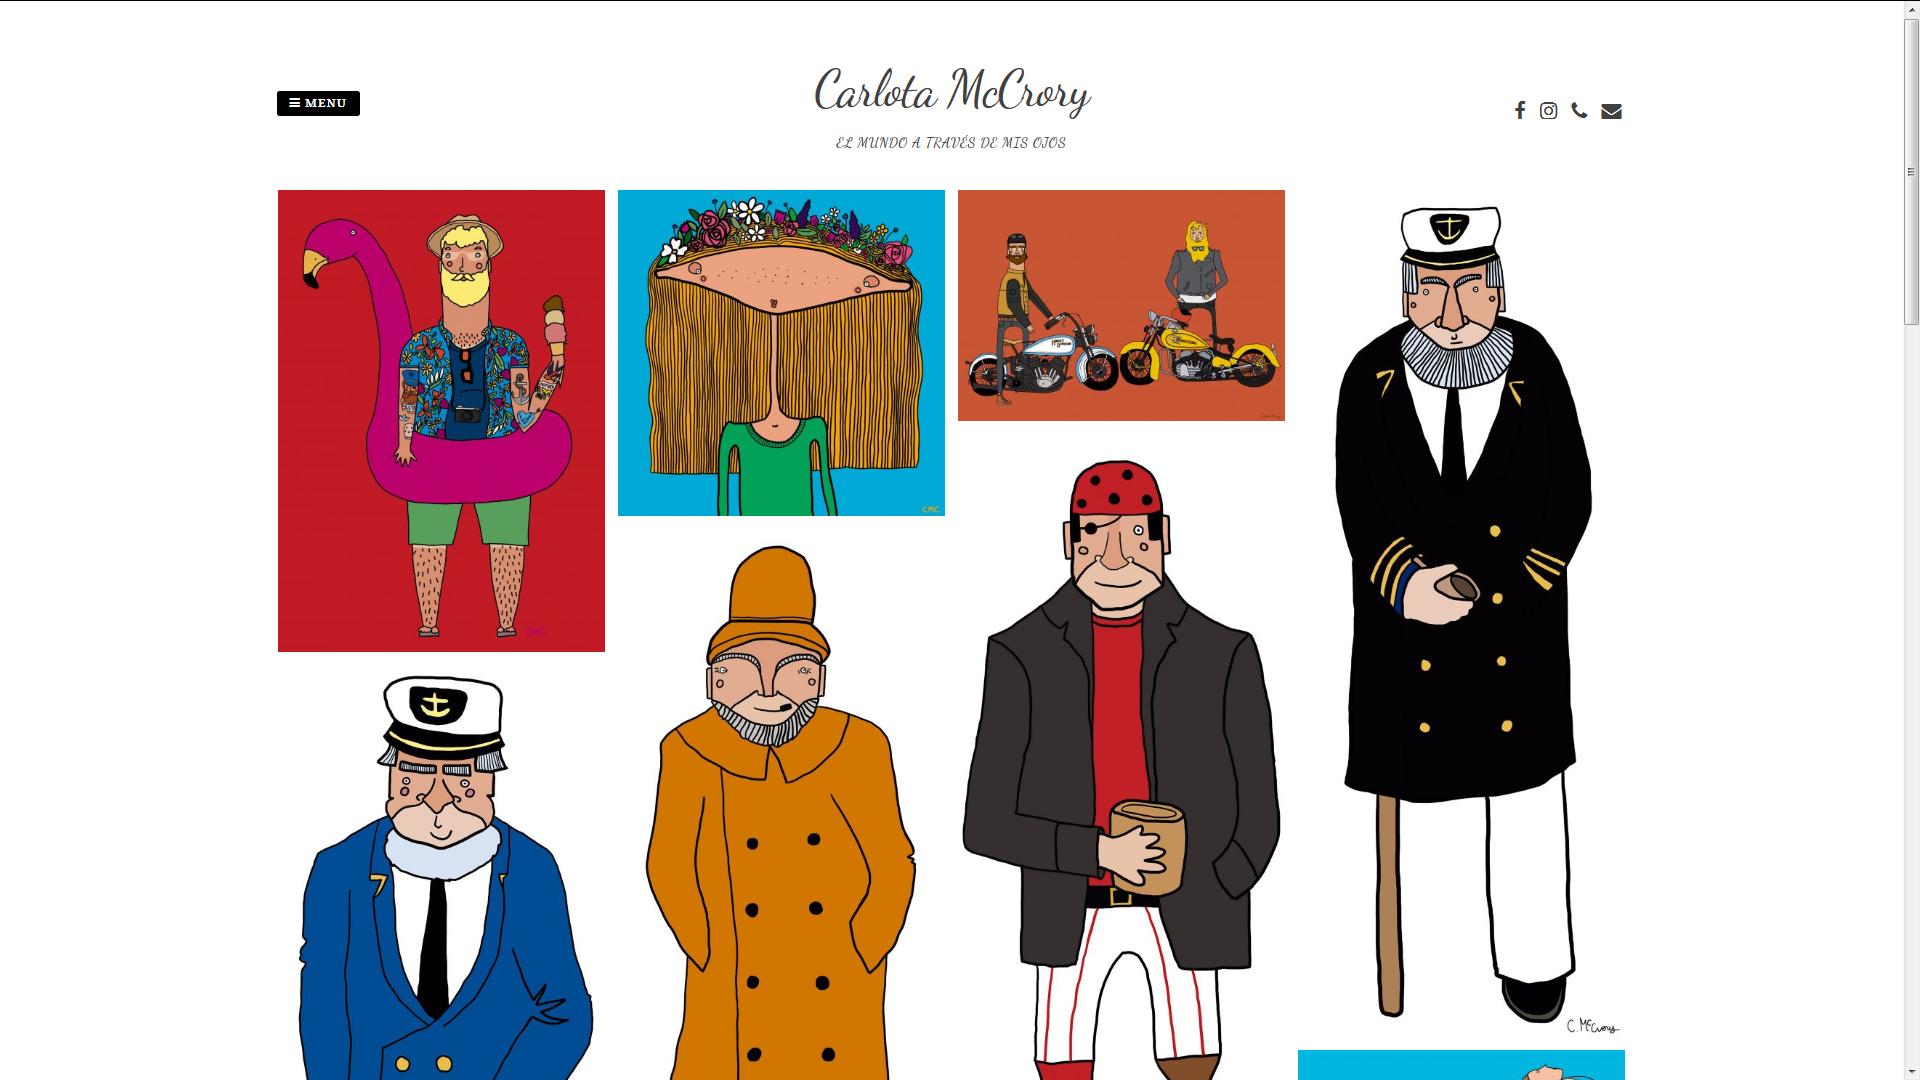 carlota mcCrory